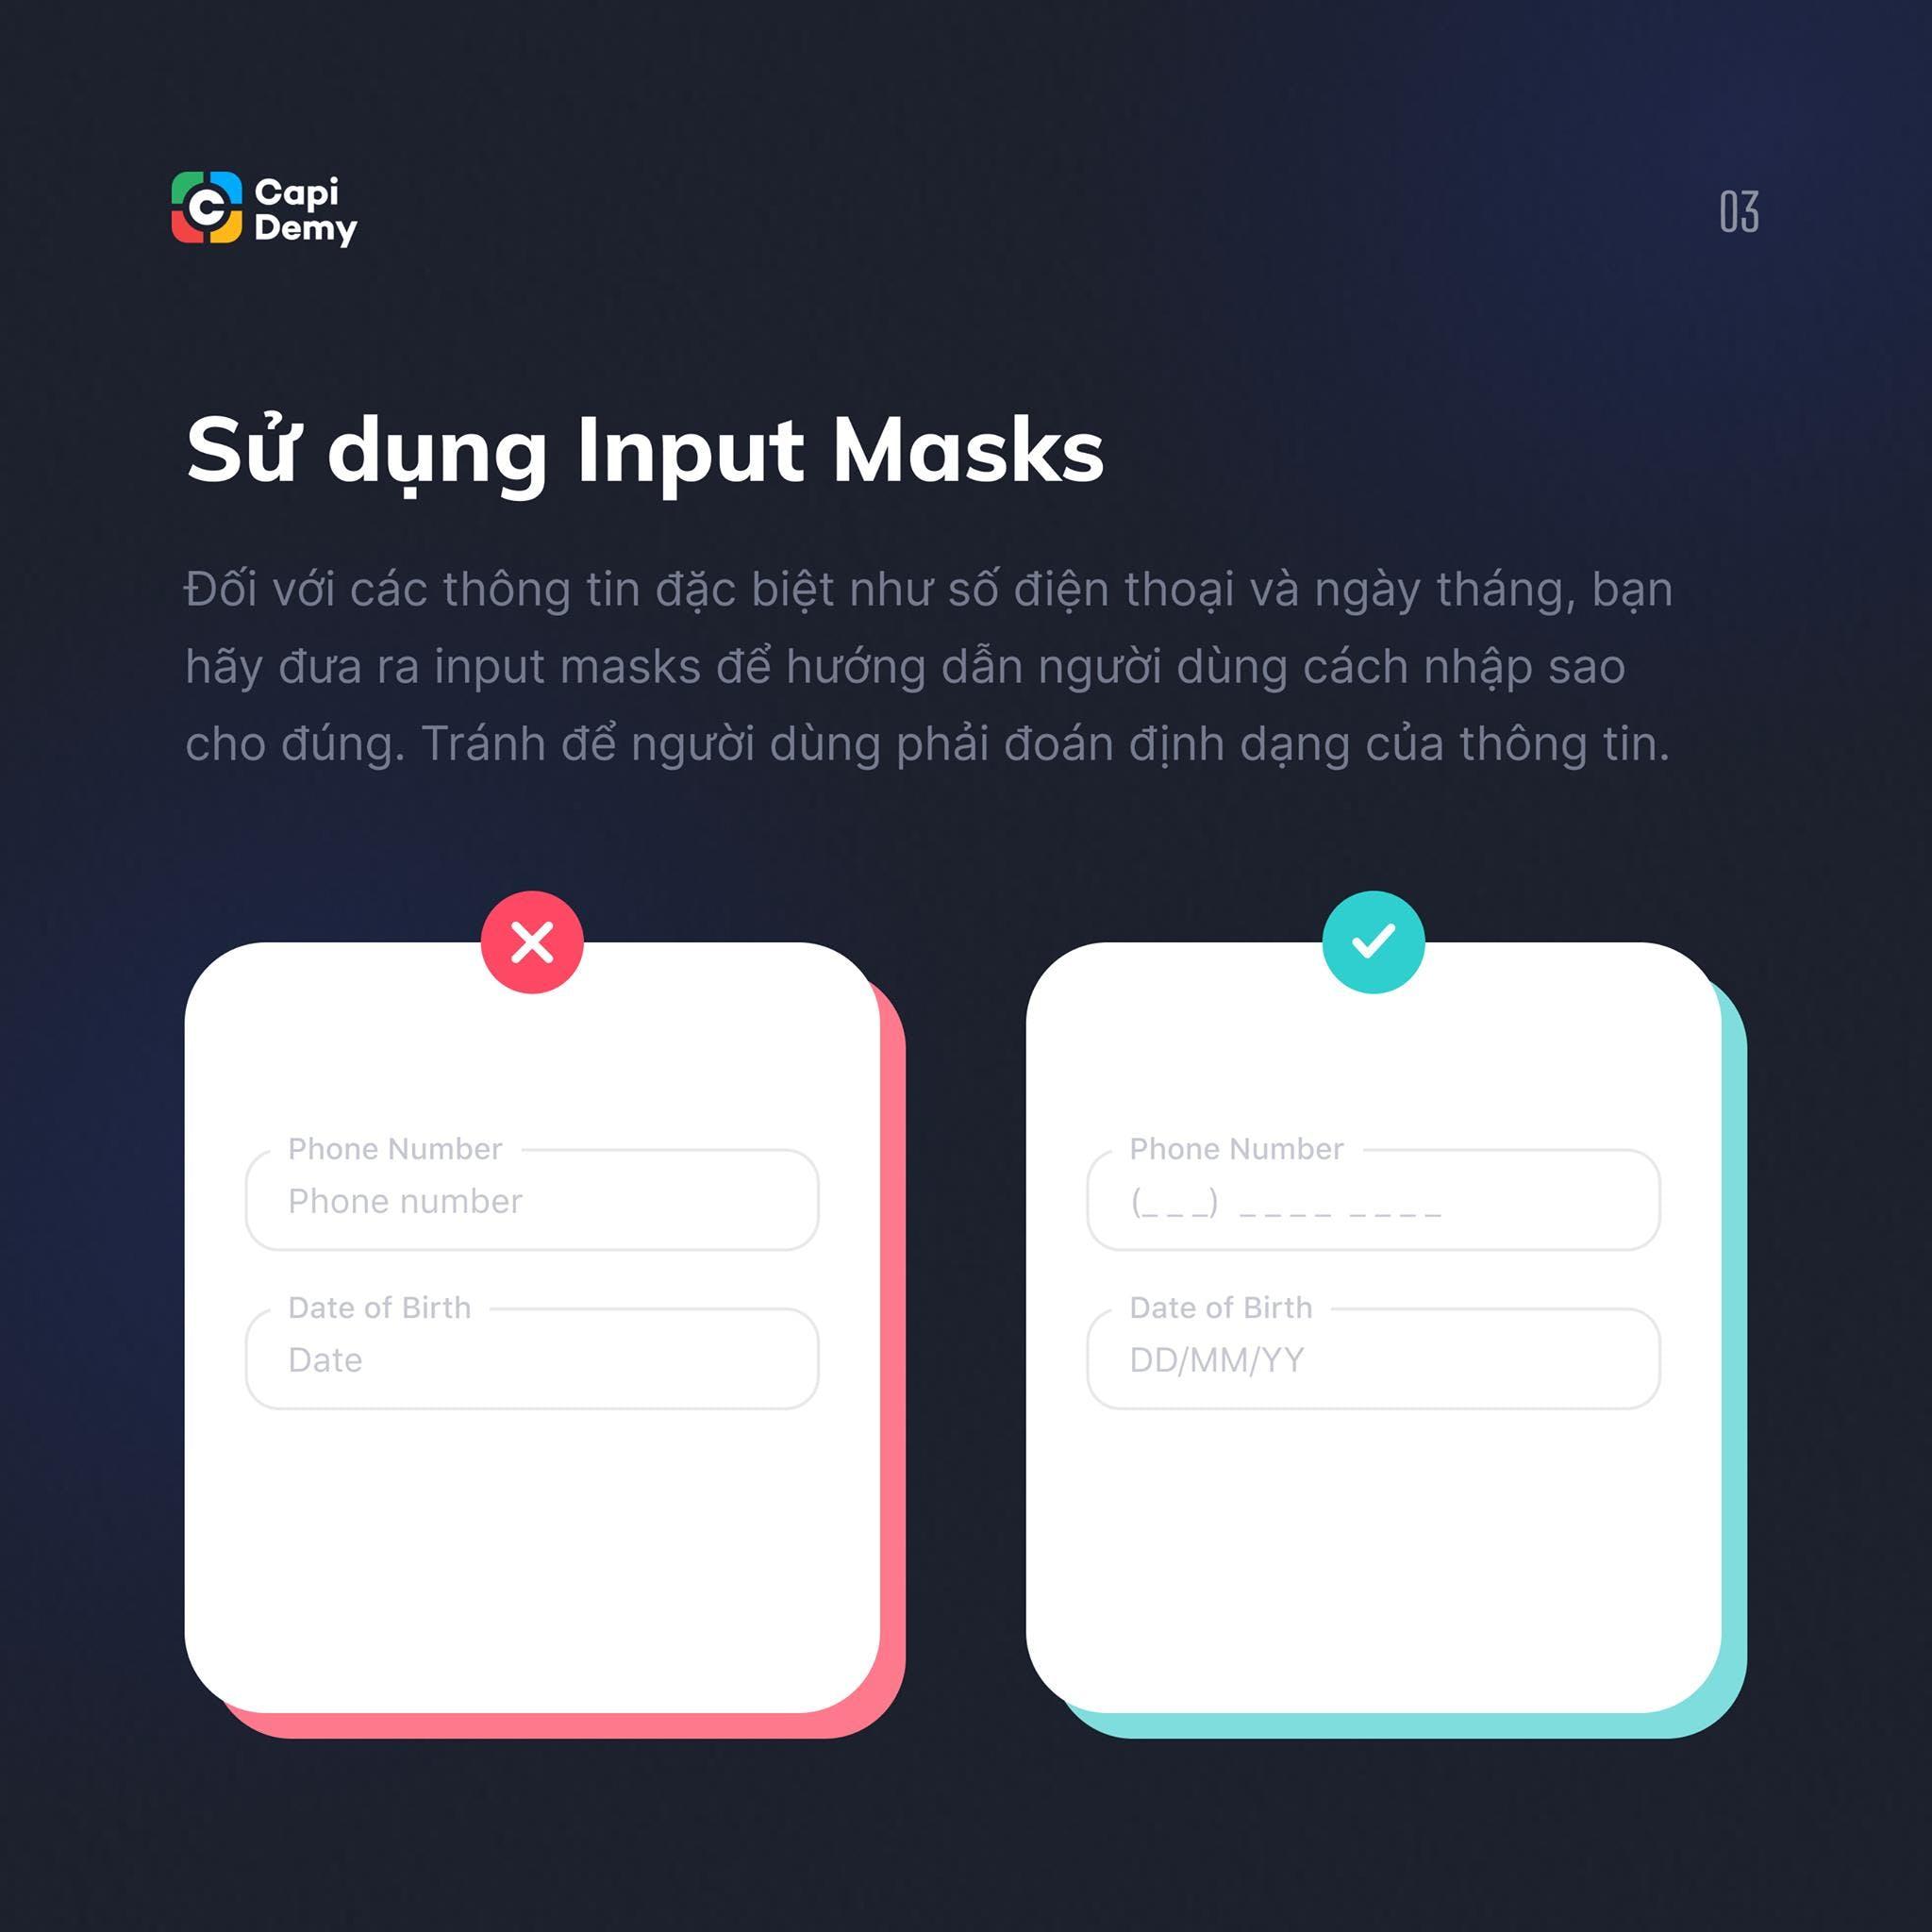 Sử dụng Input Masks